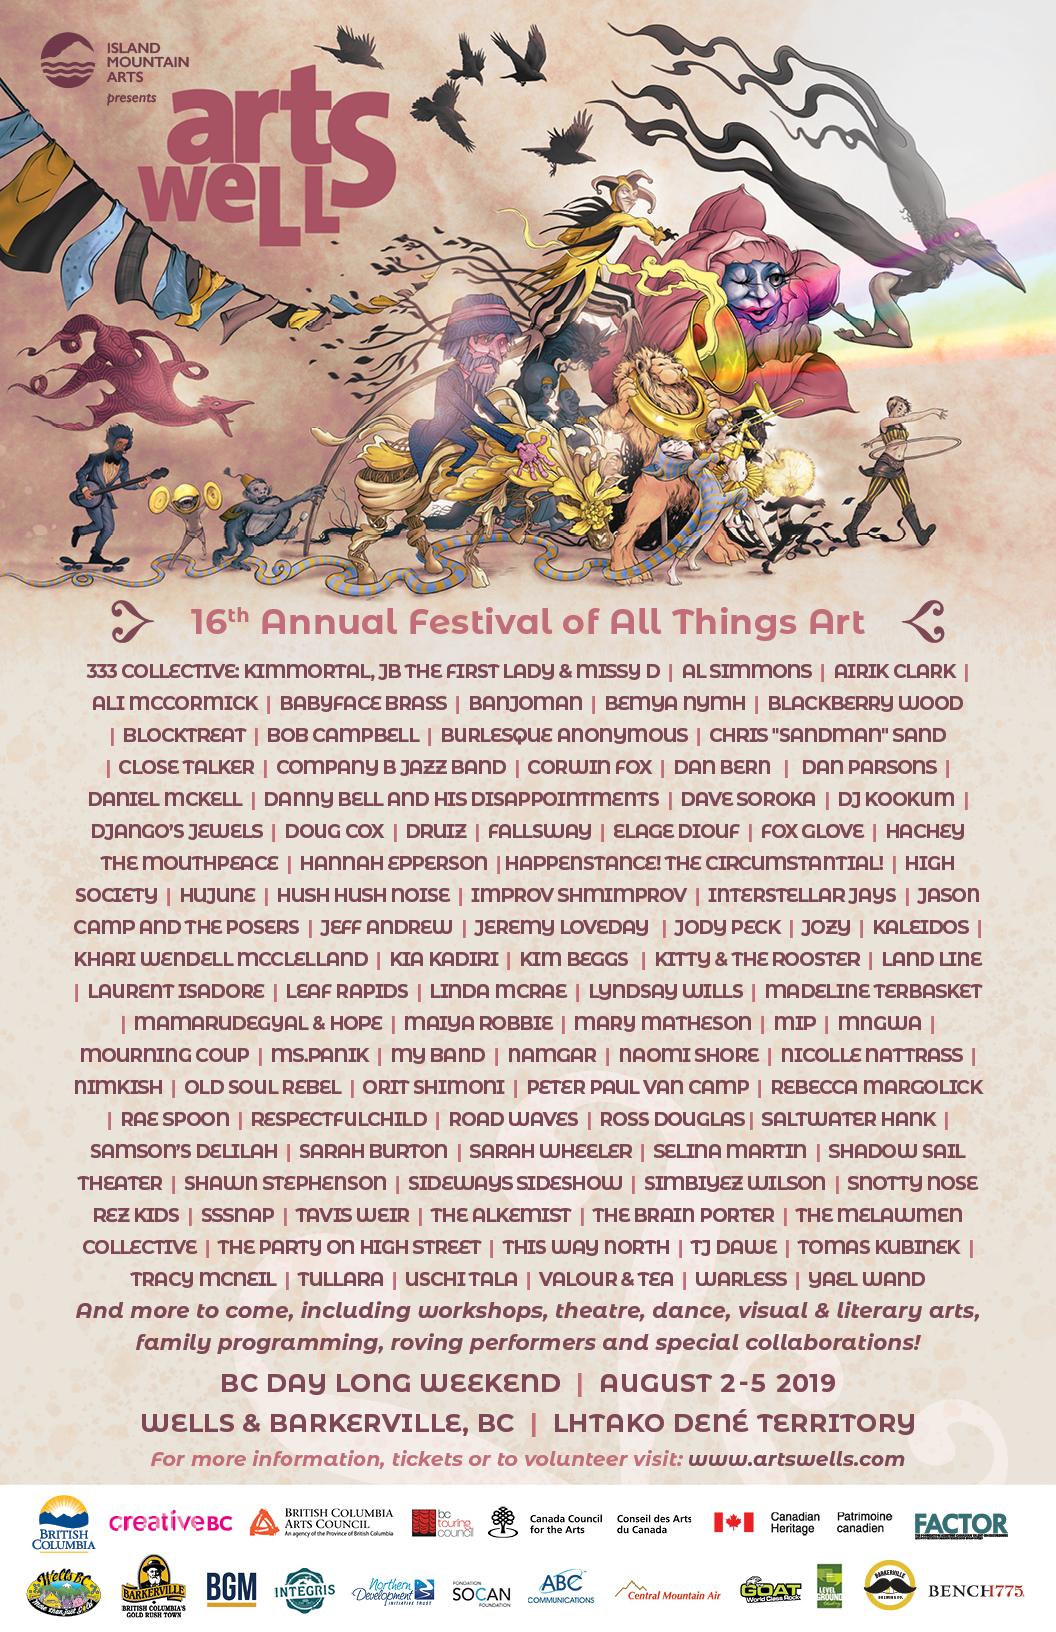 ArtsWells_Poster_PRINT.jpg